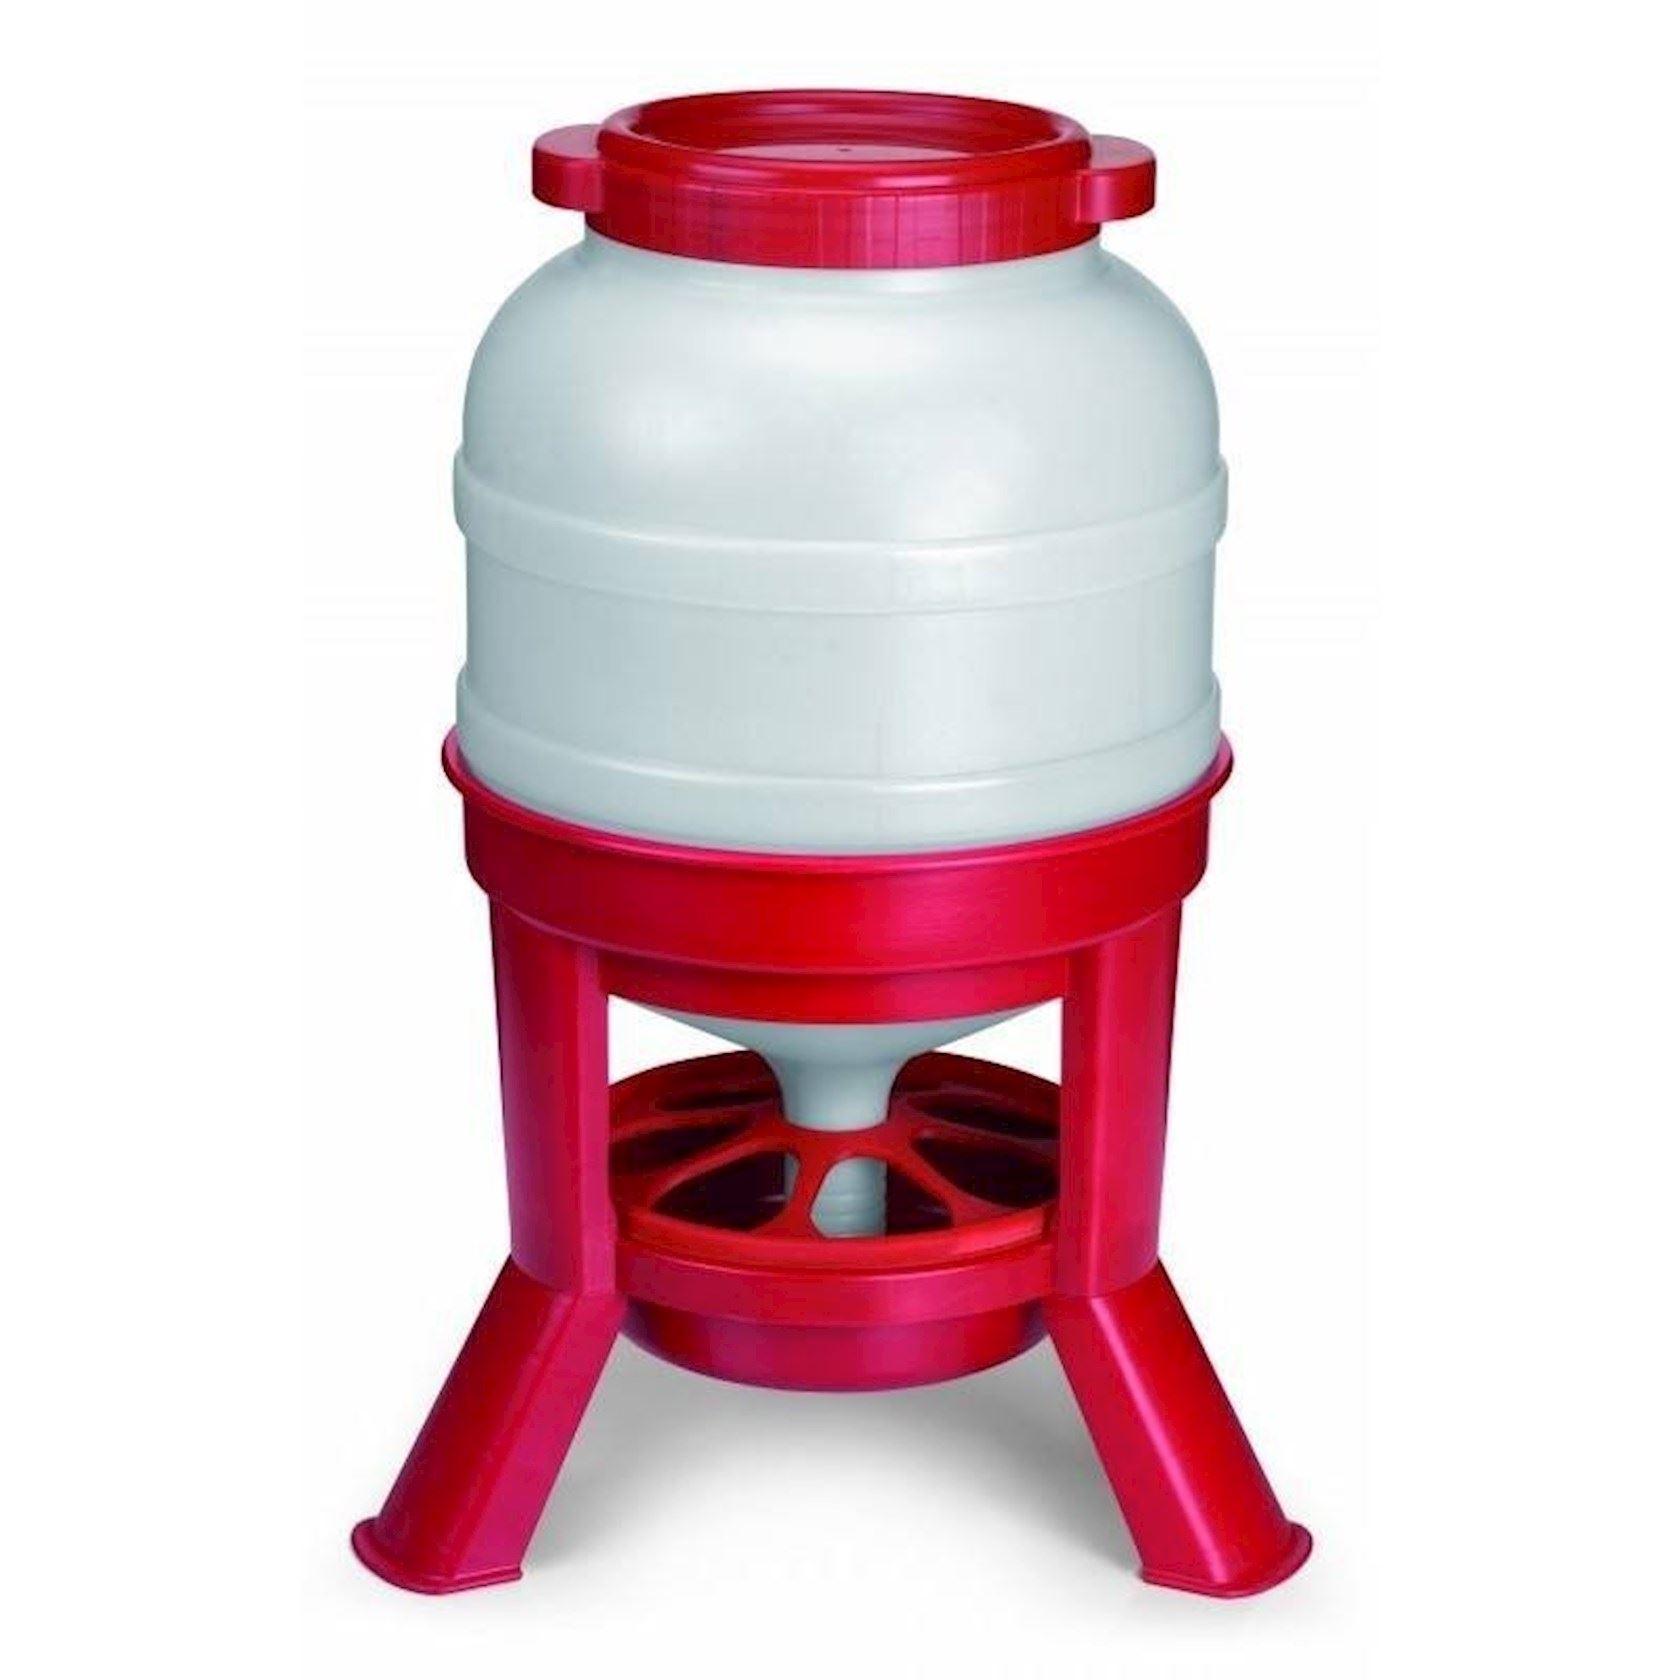 Voedersilo-rood-30-liter